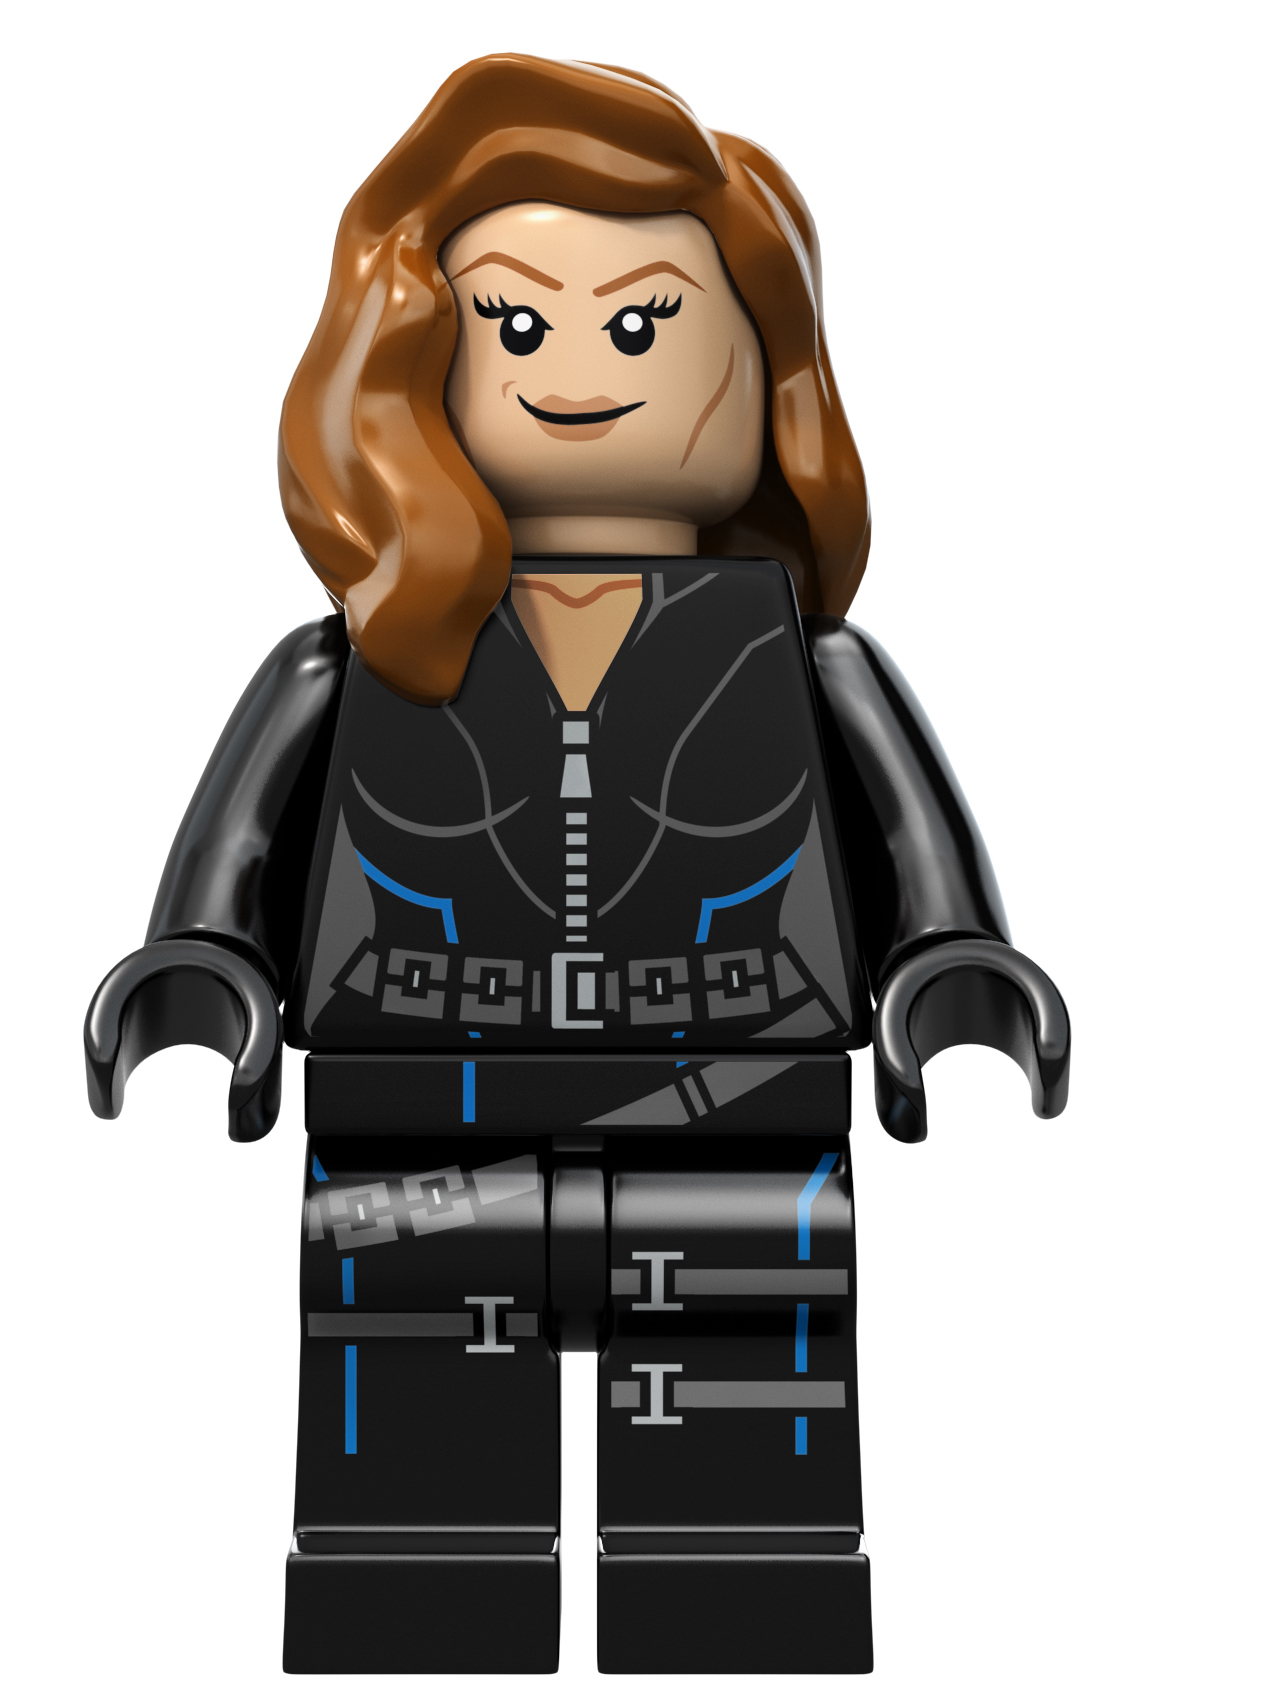 Black Widow - Captain America LEGO - HeyUGuys